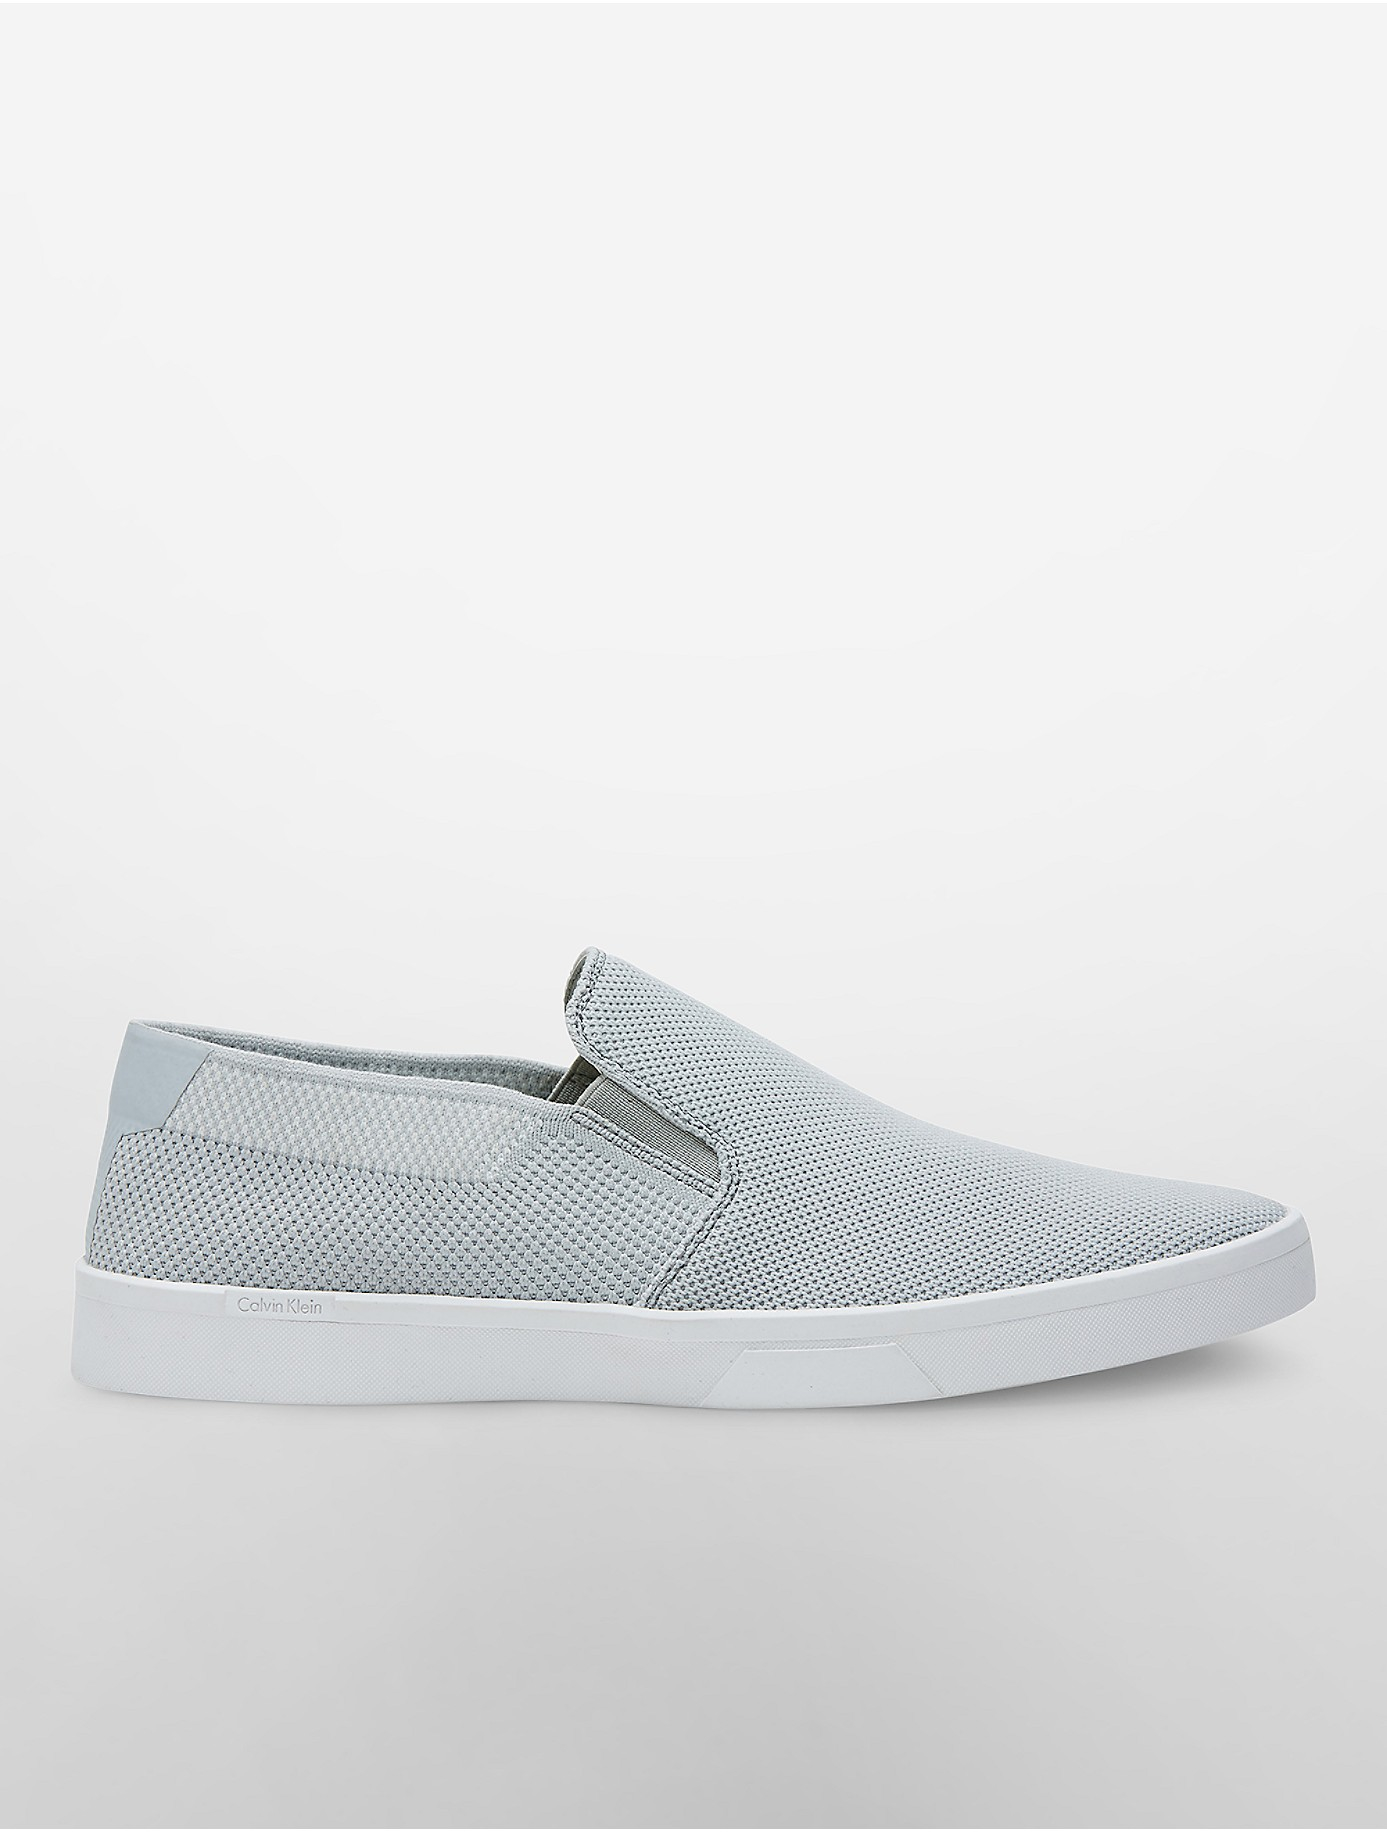 calvin klein ives slip on sneaker in gray for men lyst. Black Bedroom Furniture Sets. Home Design Ideas